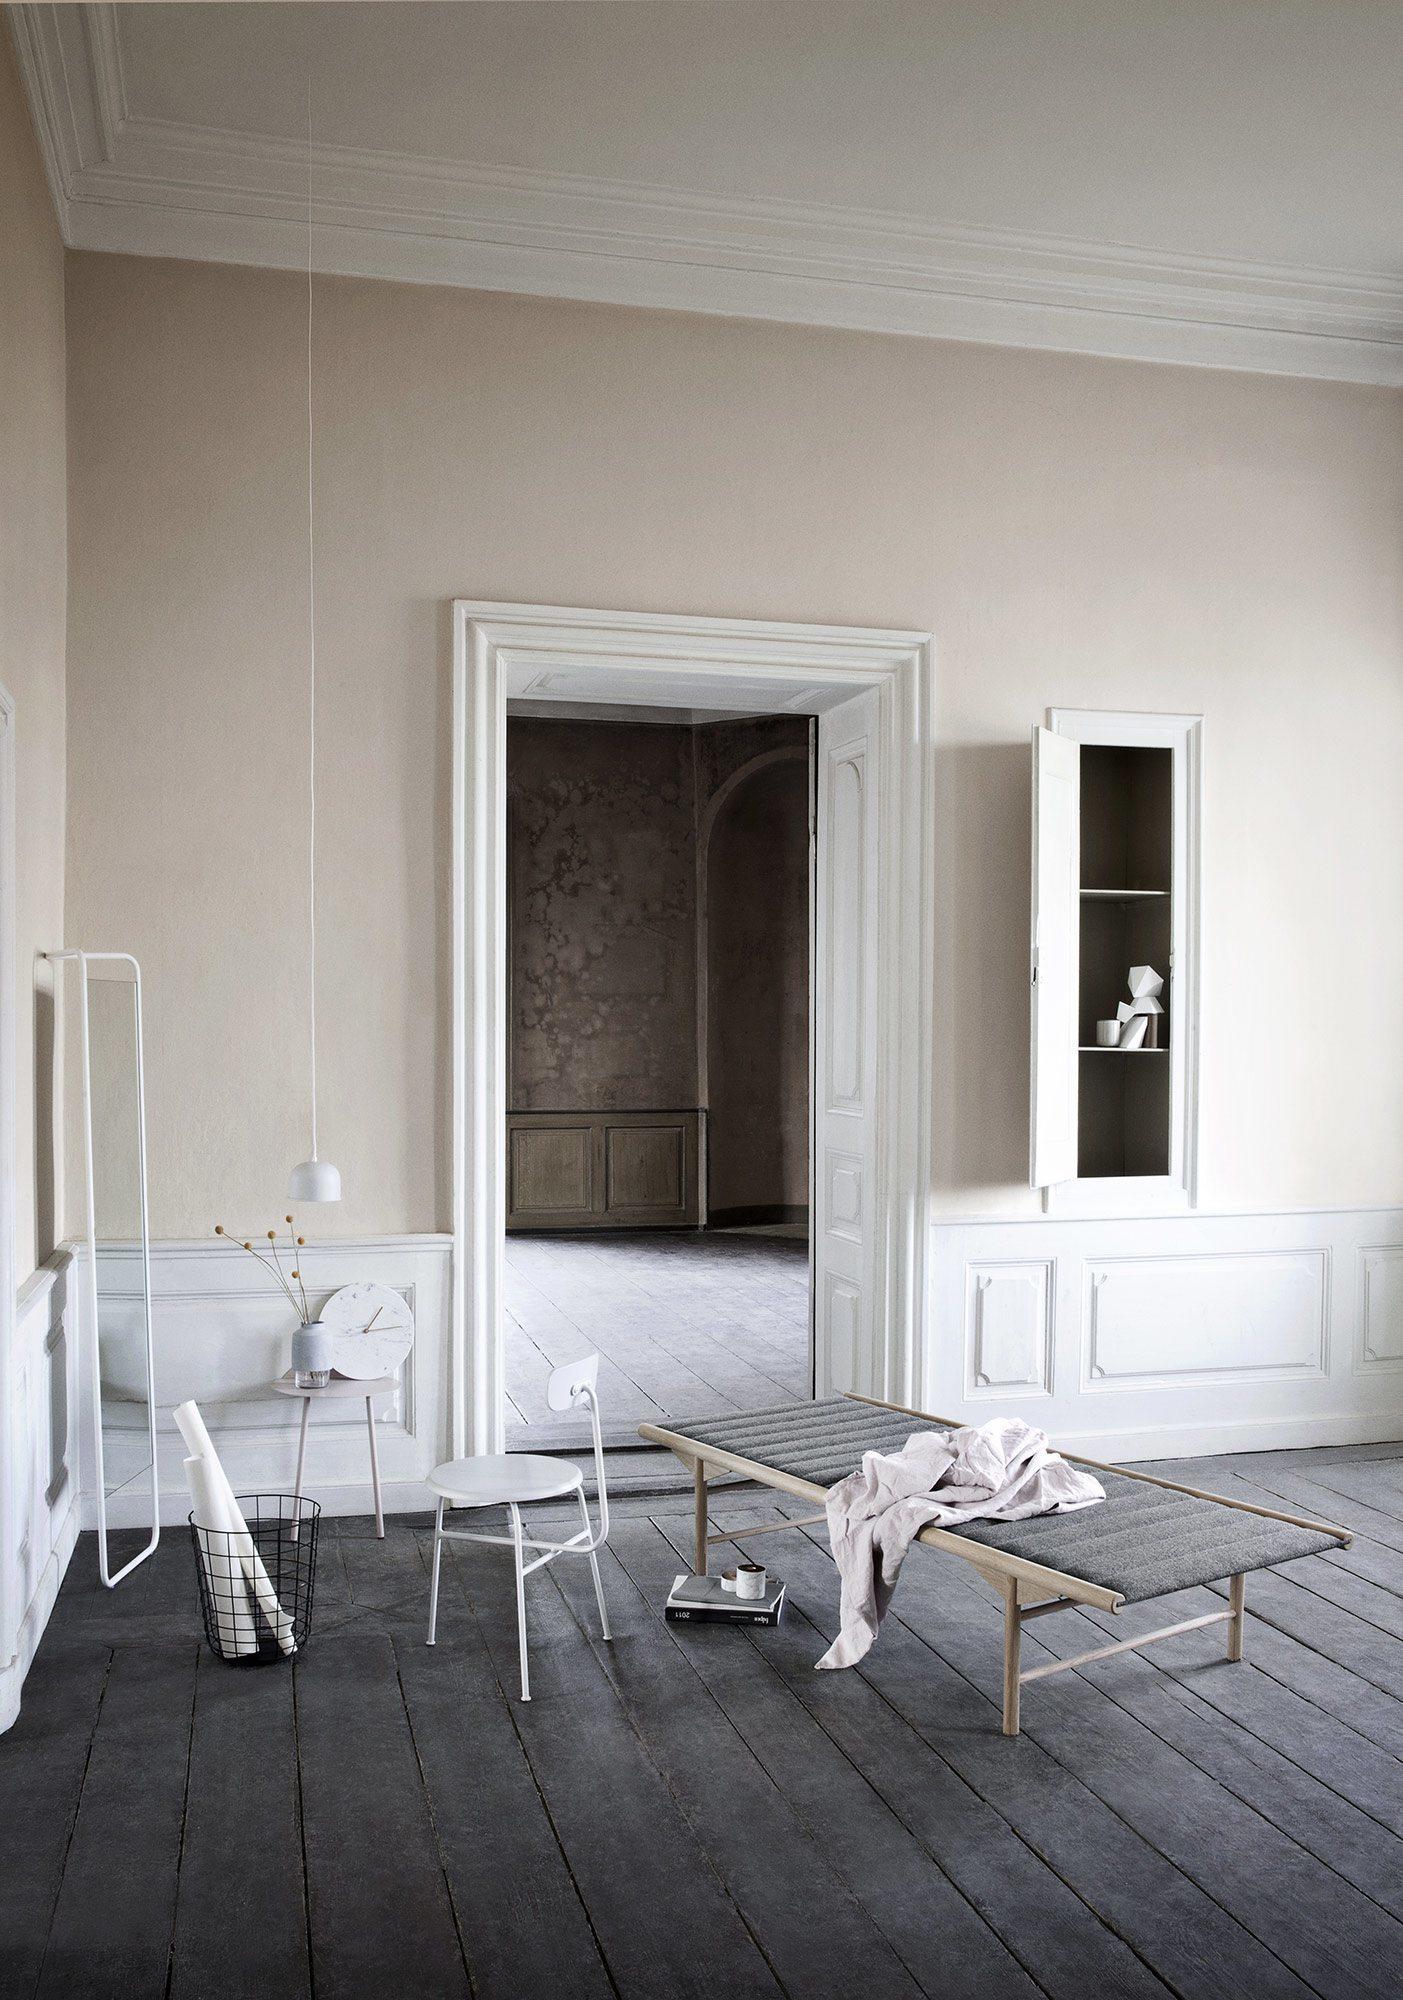 Menu design meubelen interieur plus for Interieur plus peer